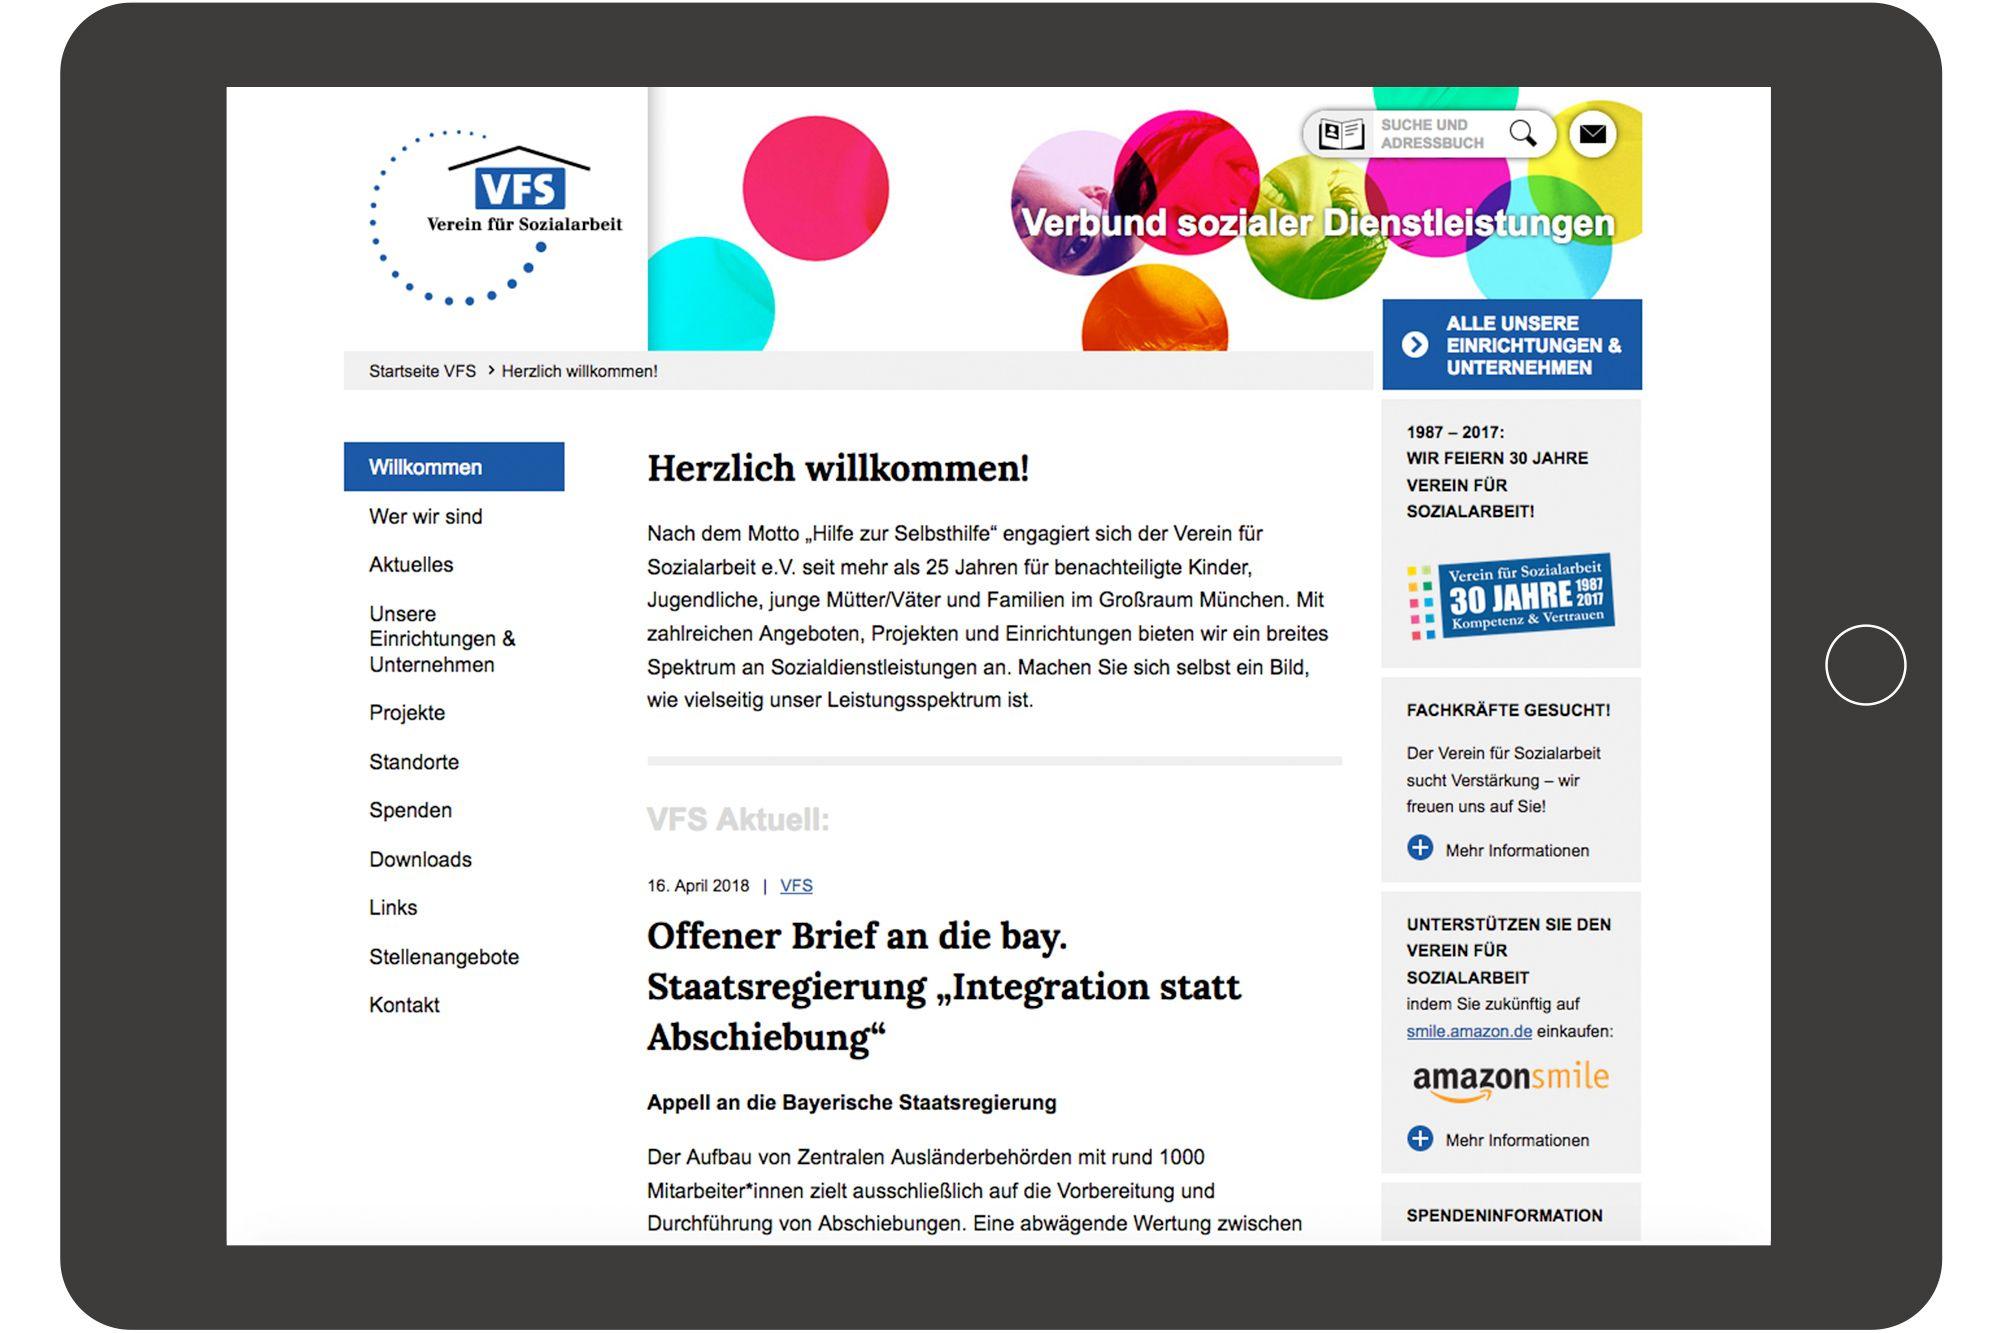 Vfs Website